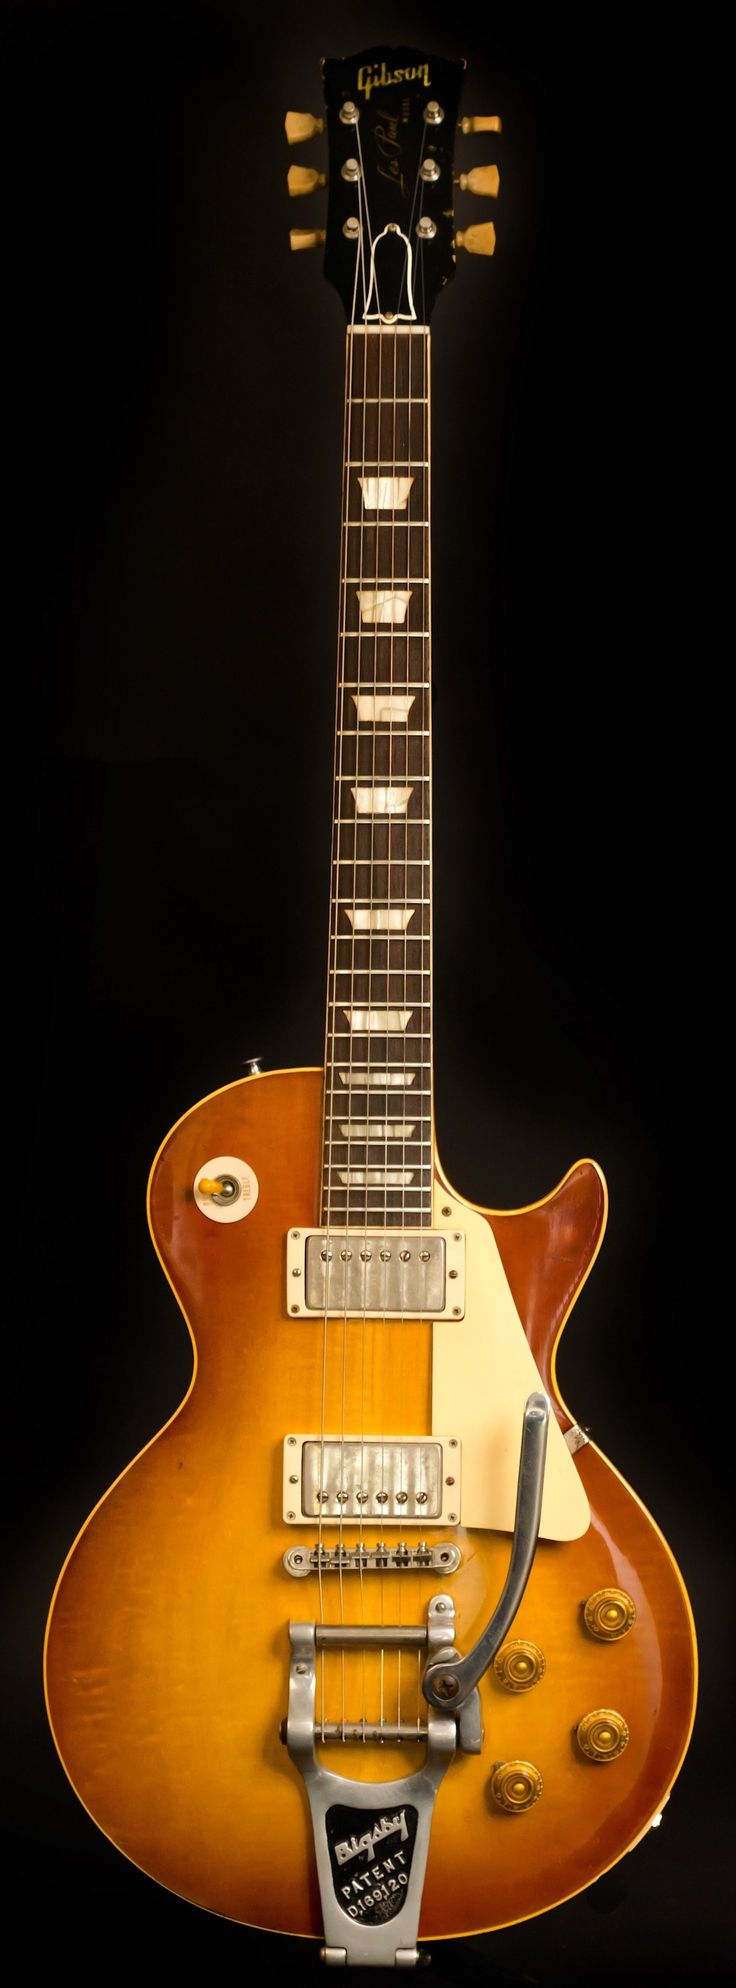 Matthias Jabs 1959 Gibson Les Paul 9-0890